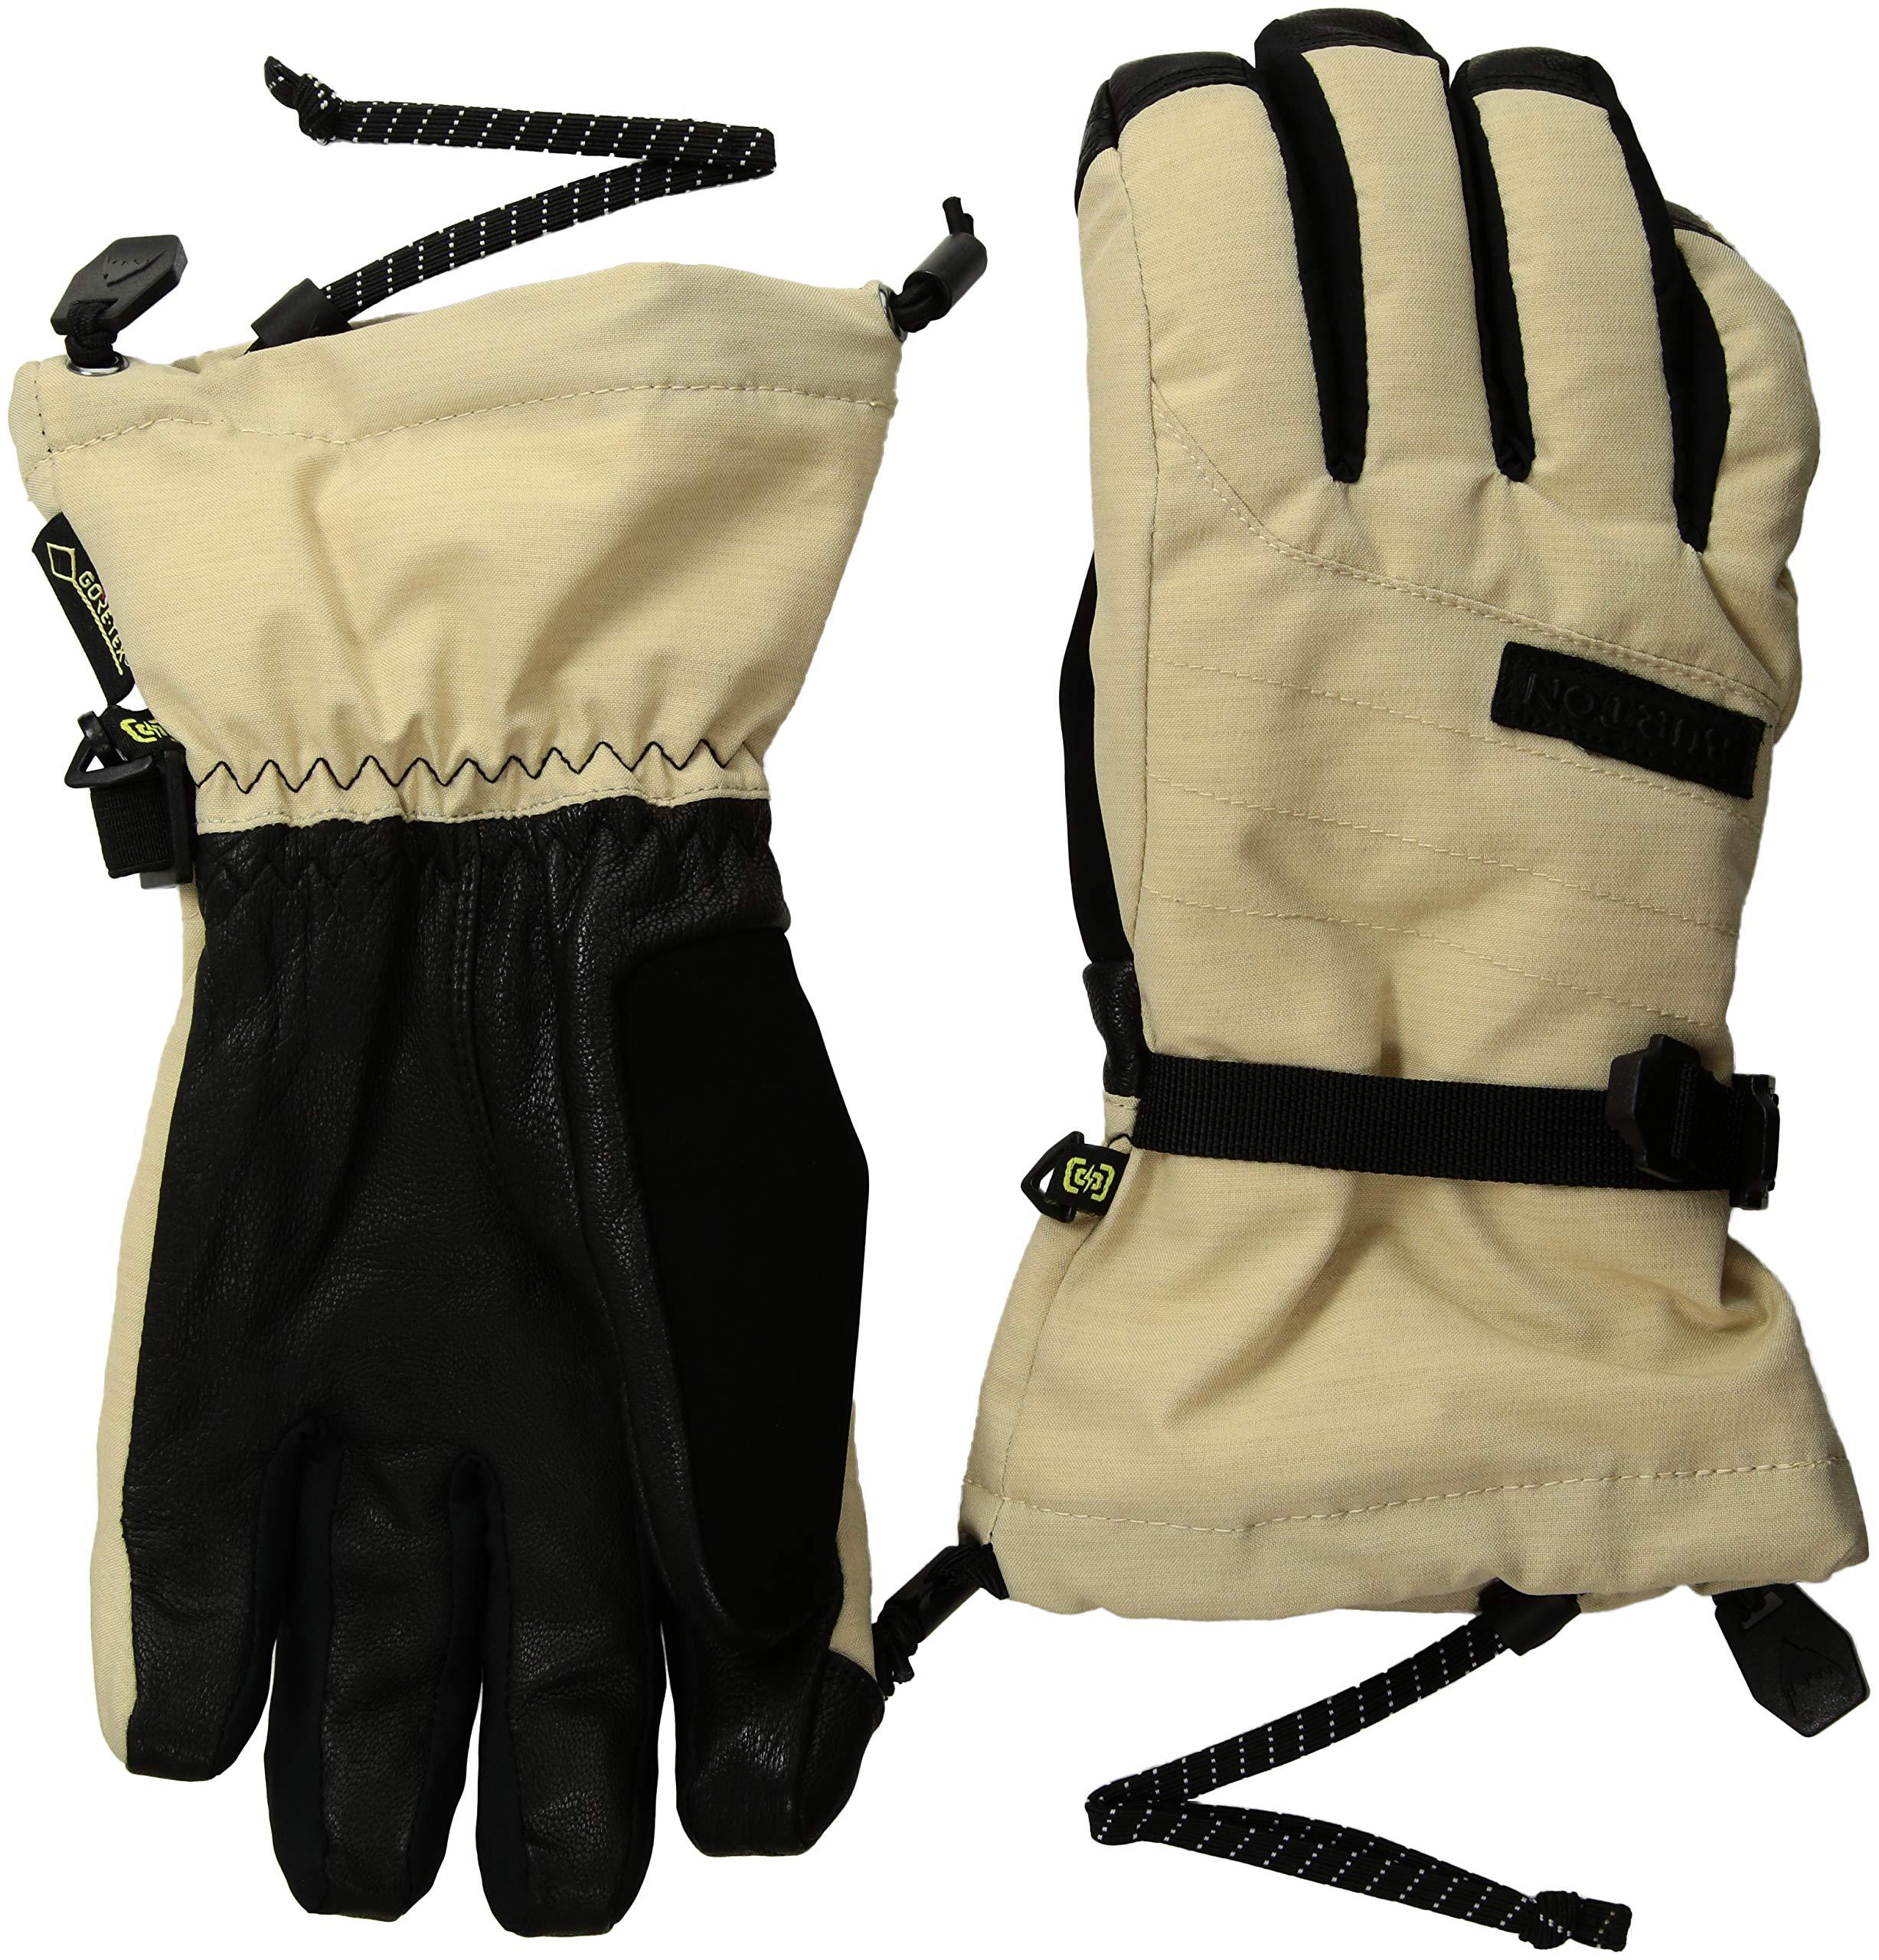 Burton Women's Deluxe Gore-tex Glove, Pebble Heather, Medium